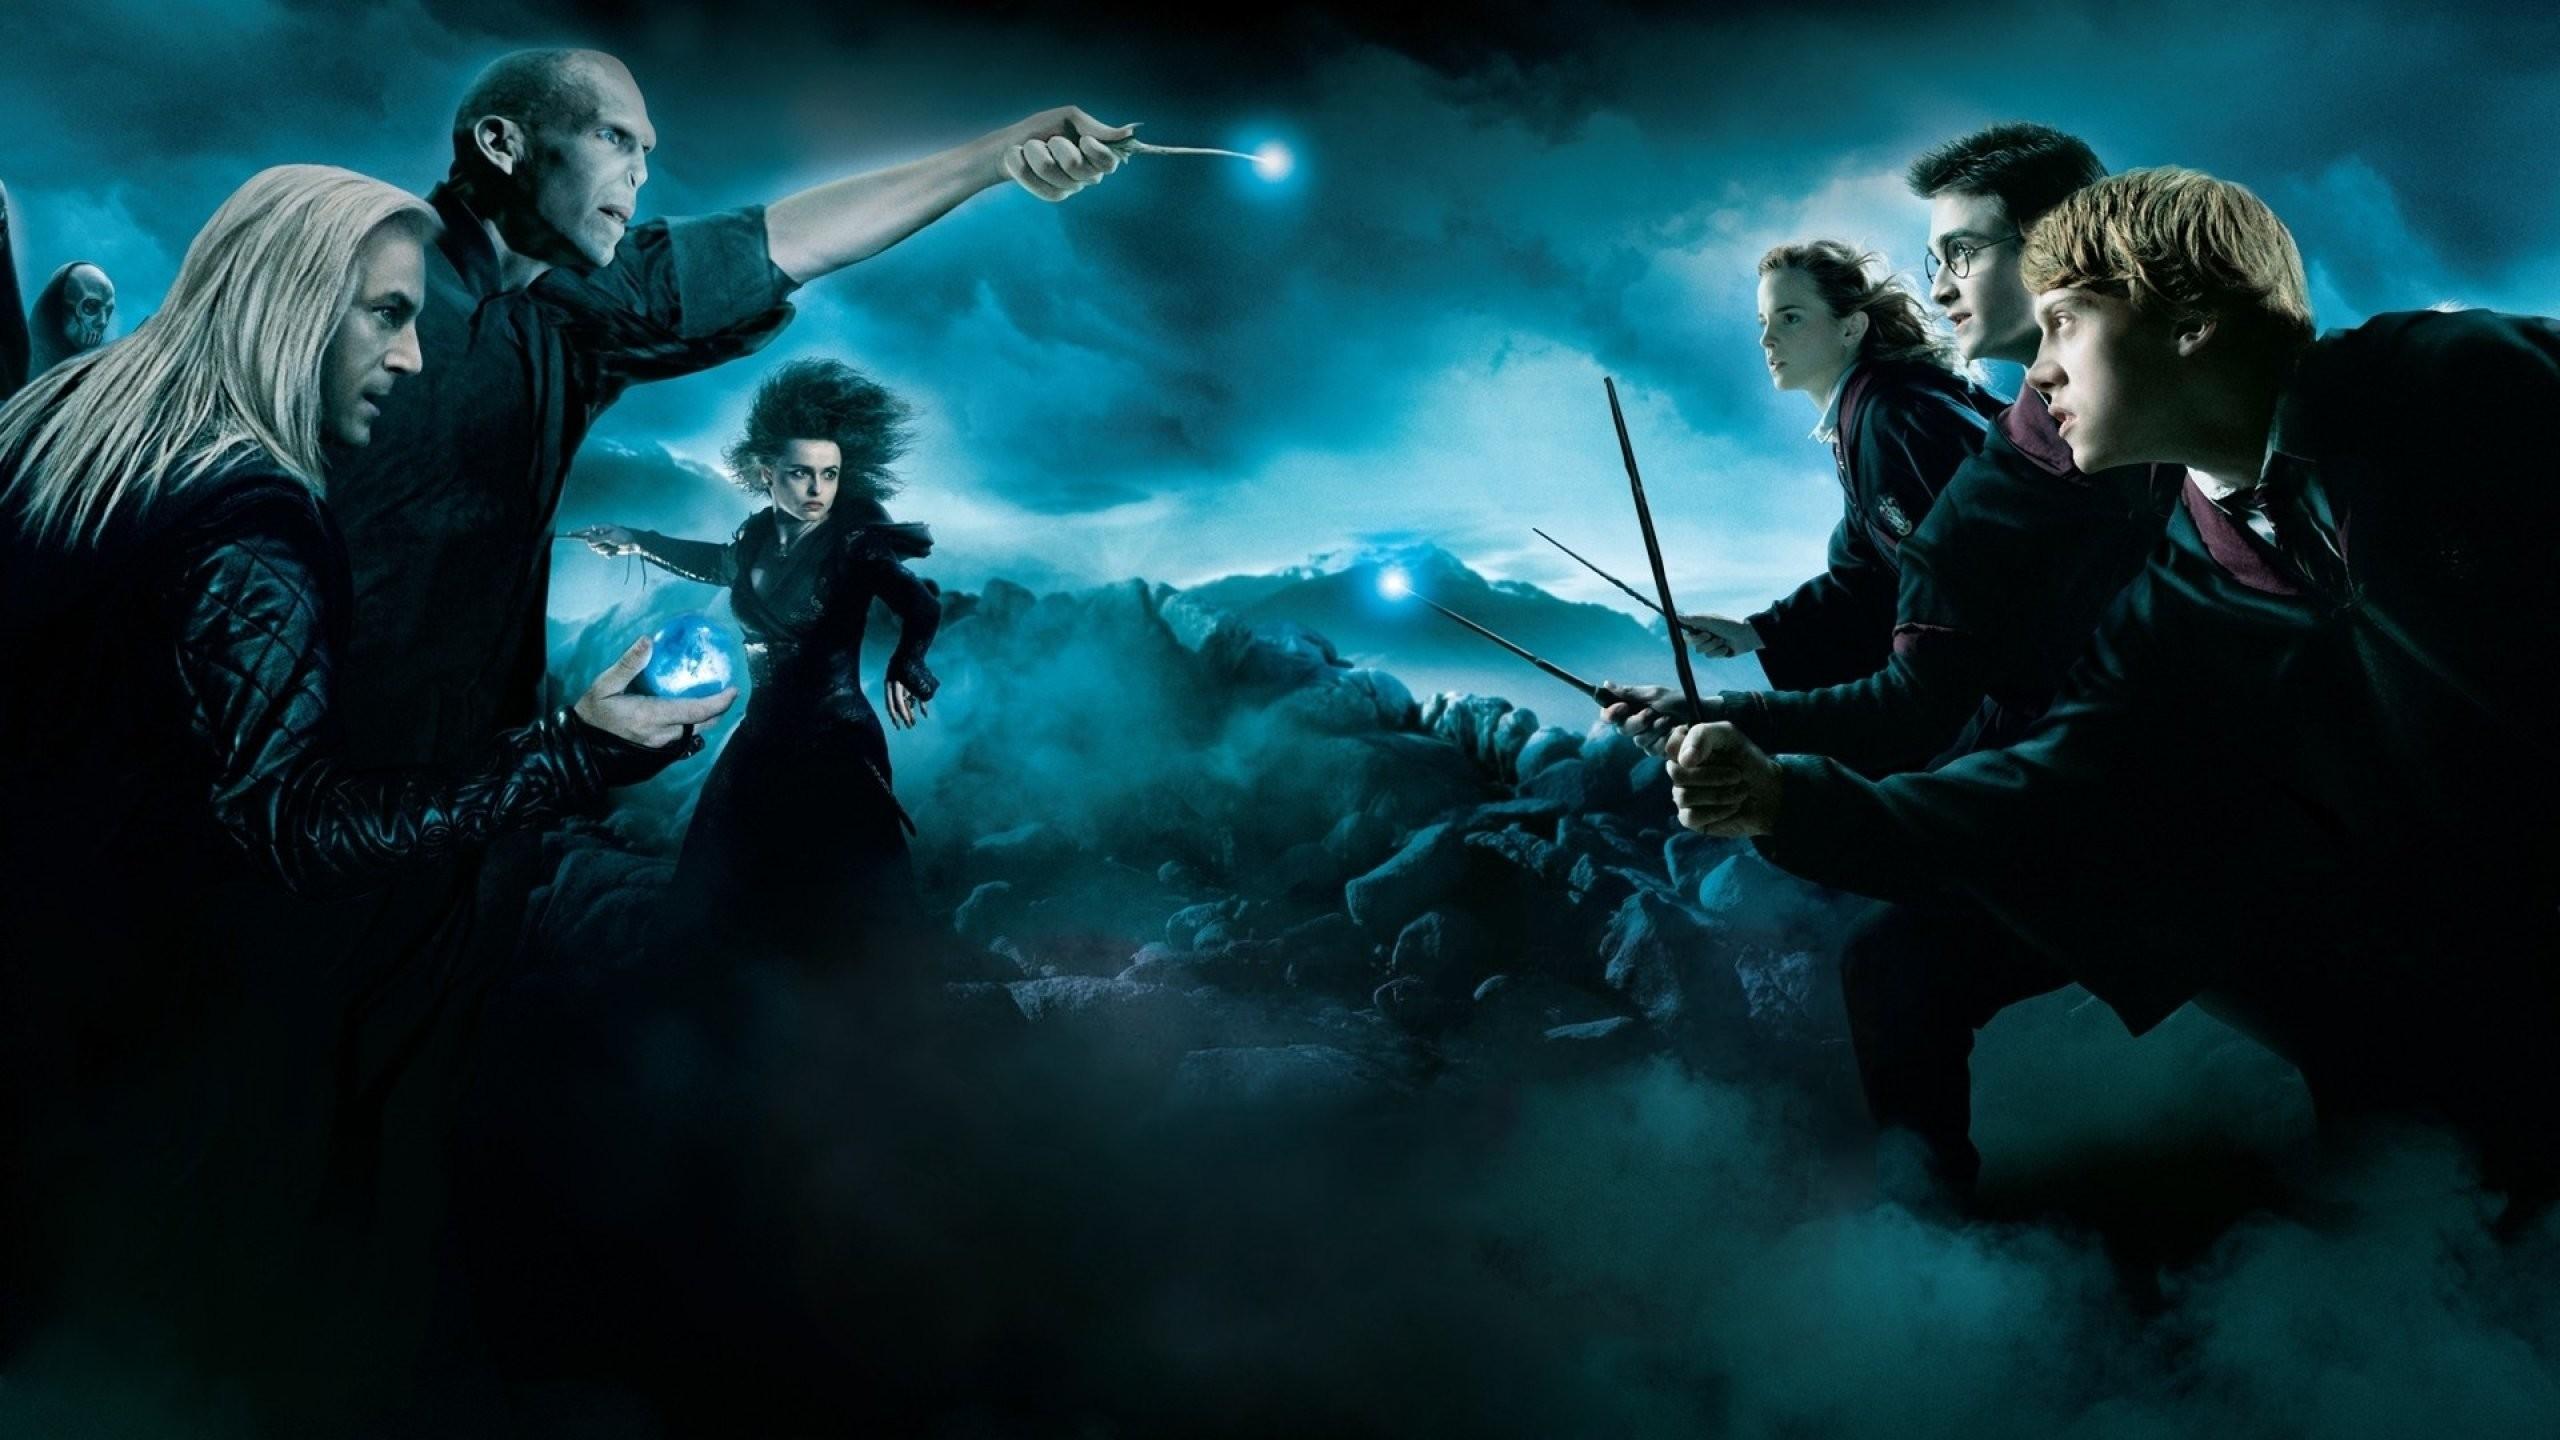 Desktop Backgrounds HD | The World's #1 Harry Potter Wallpaper –  Coachoutletasb.com